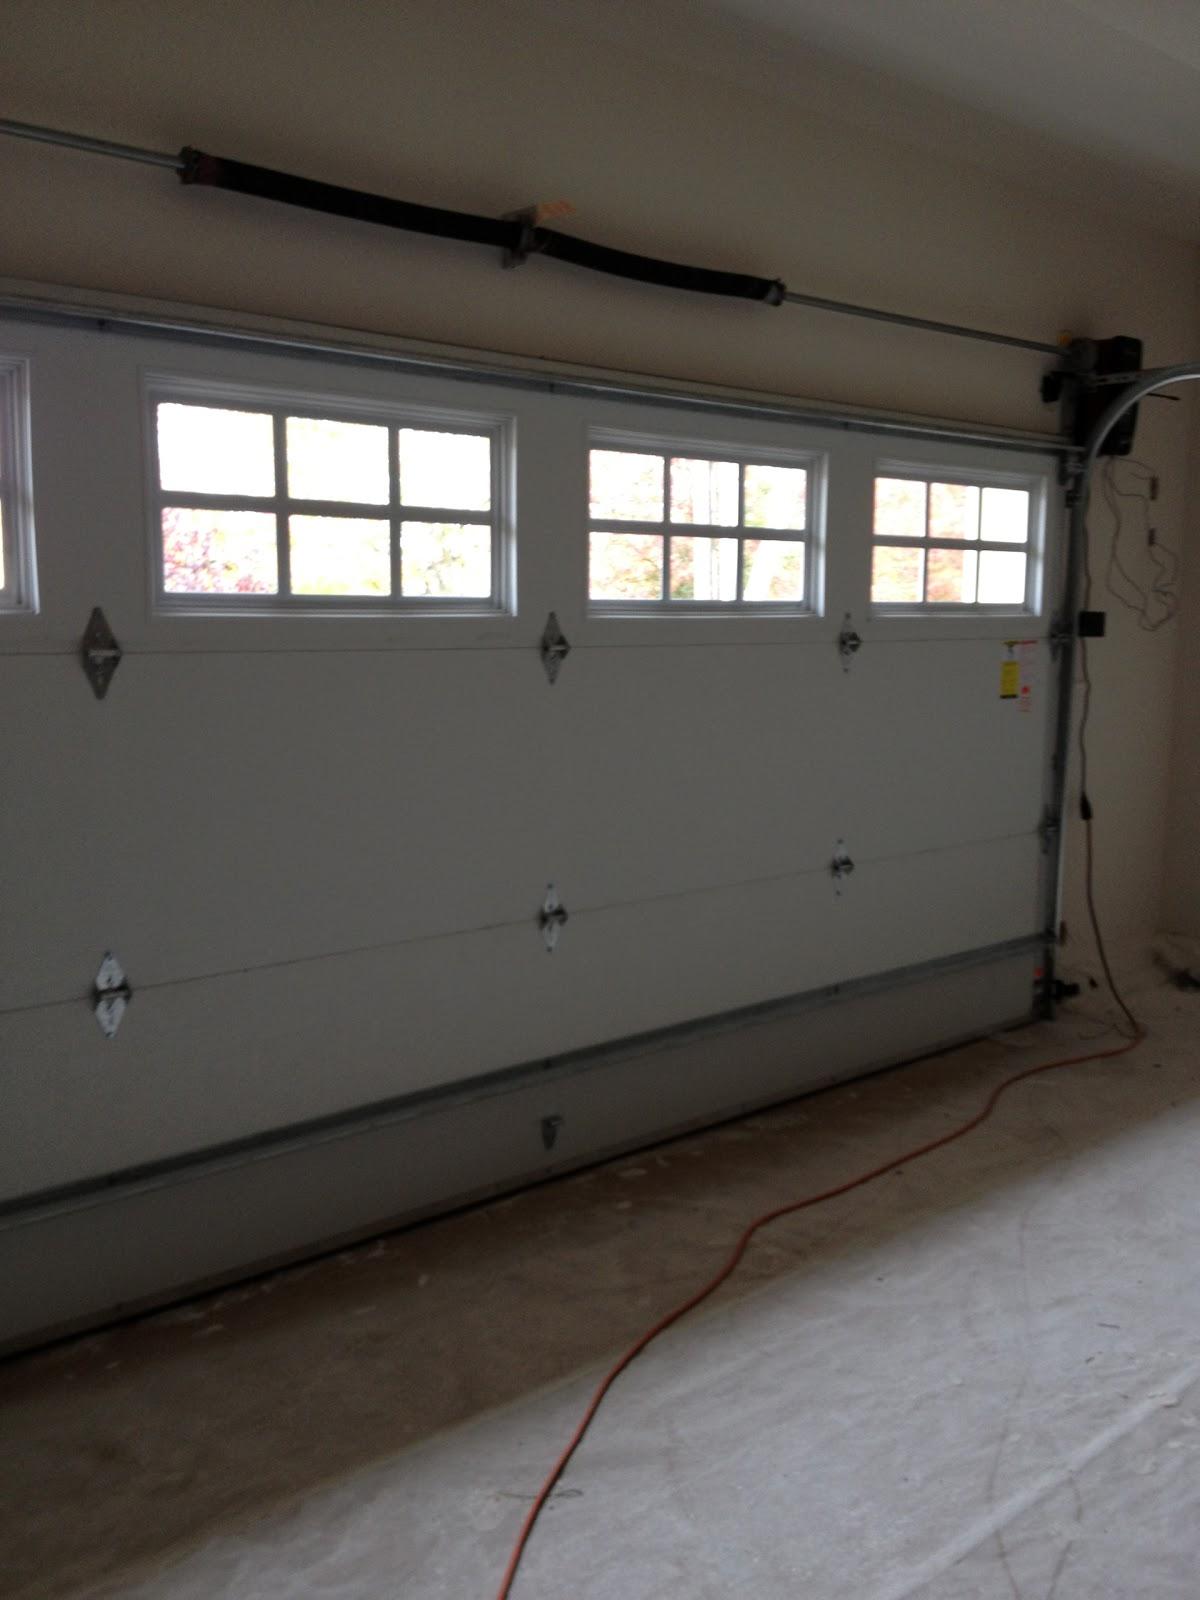 1600 #857346  Home From The Ground Up: Progress Photos Garage Door Installation pic Garage Doors Installed 36811200